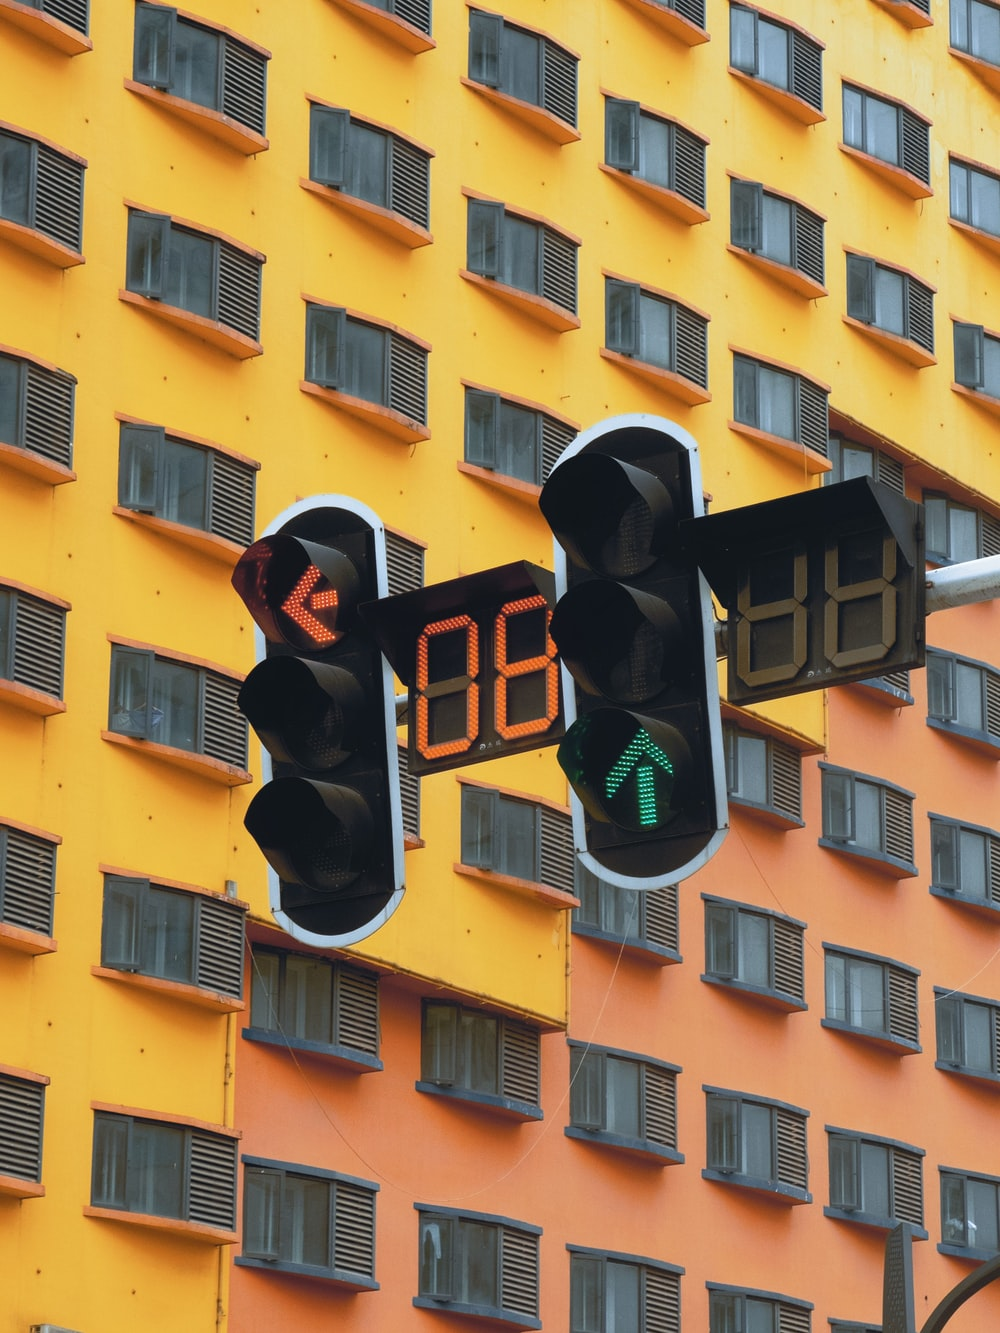 two traffic lights